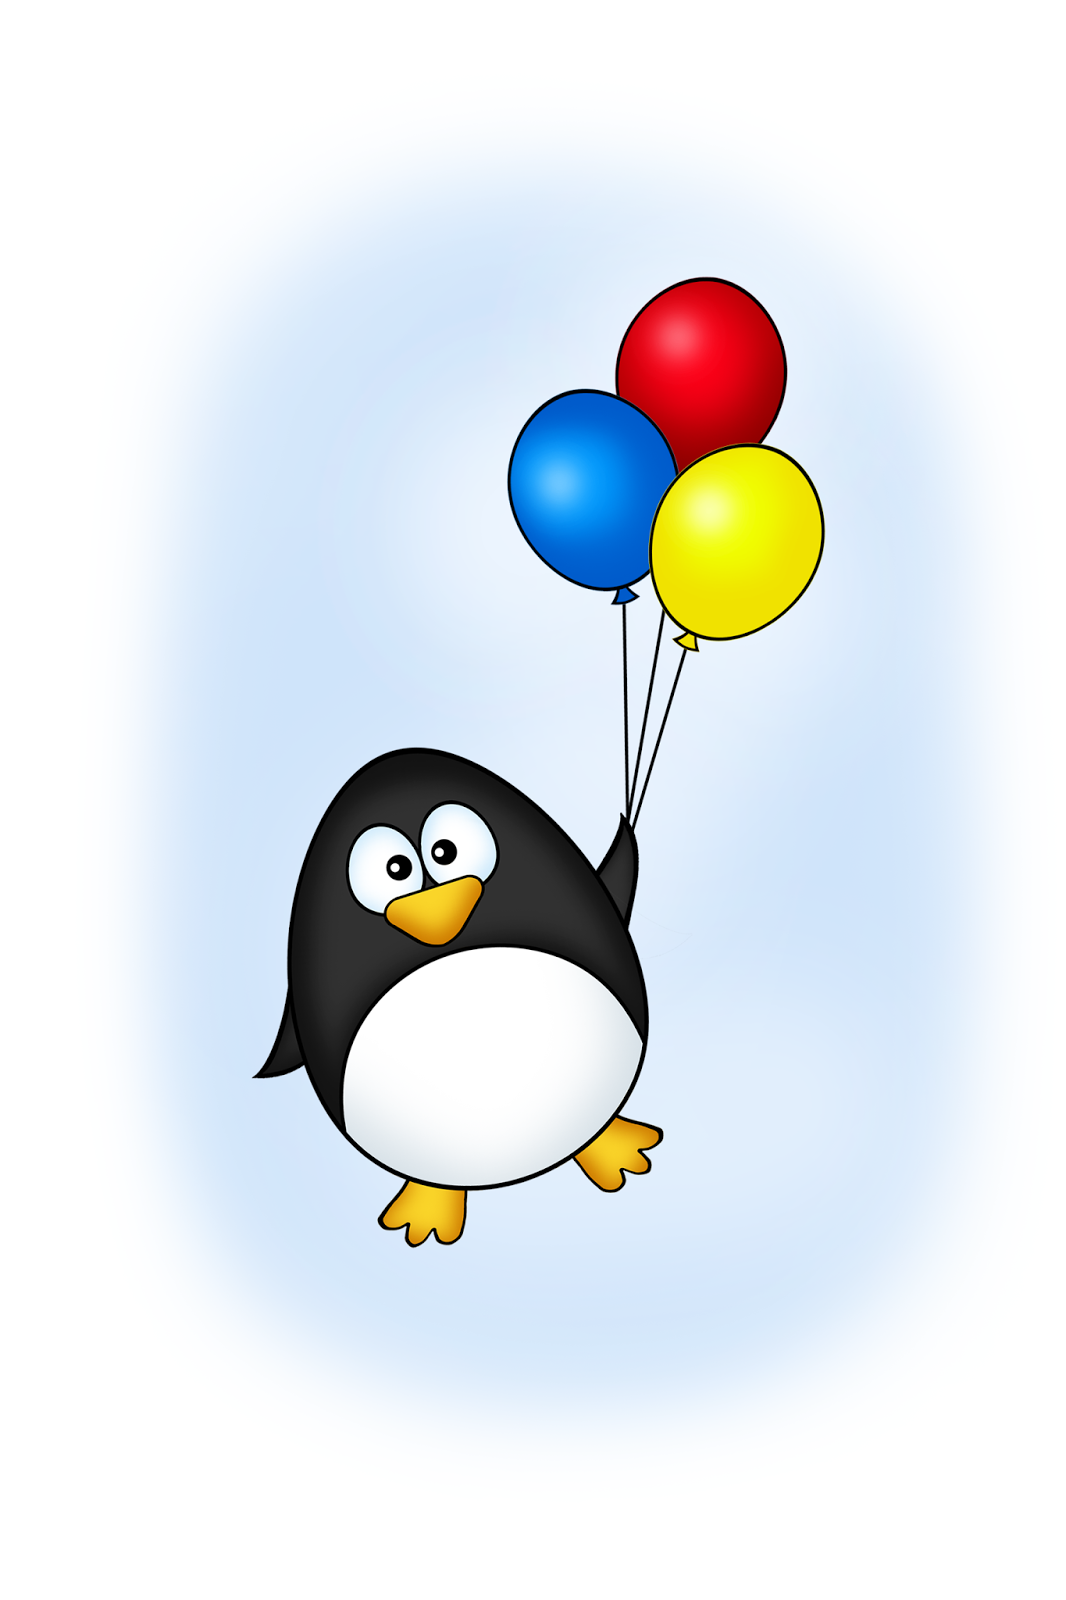 subi qian penguin with balloons